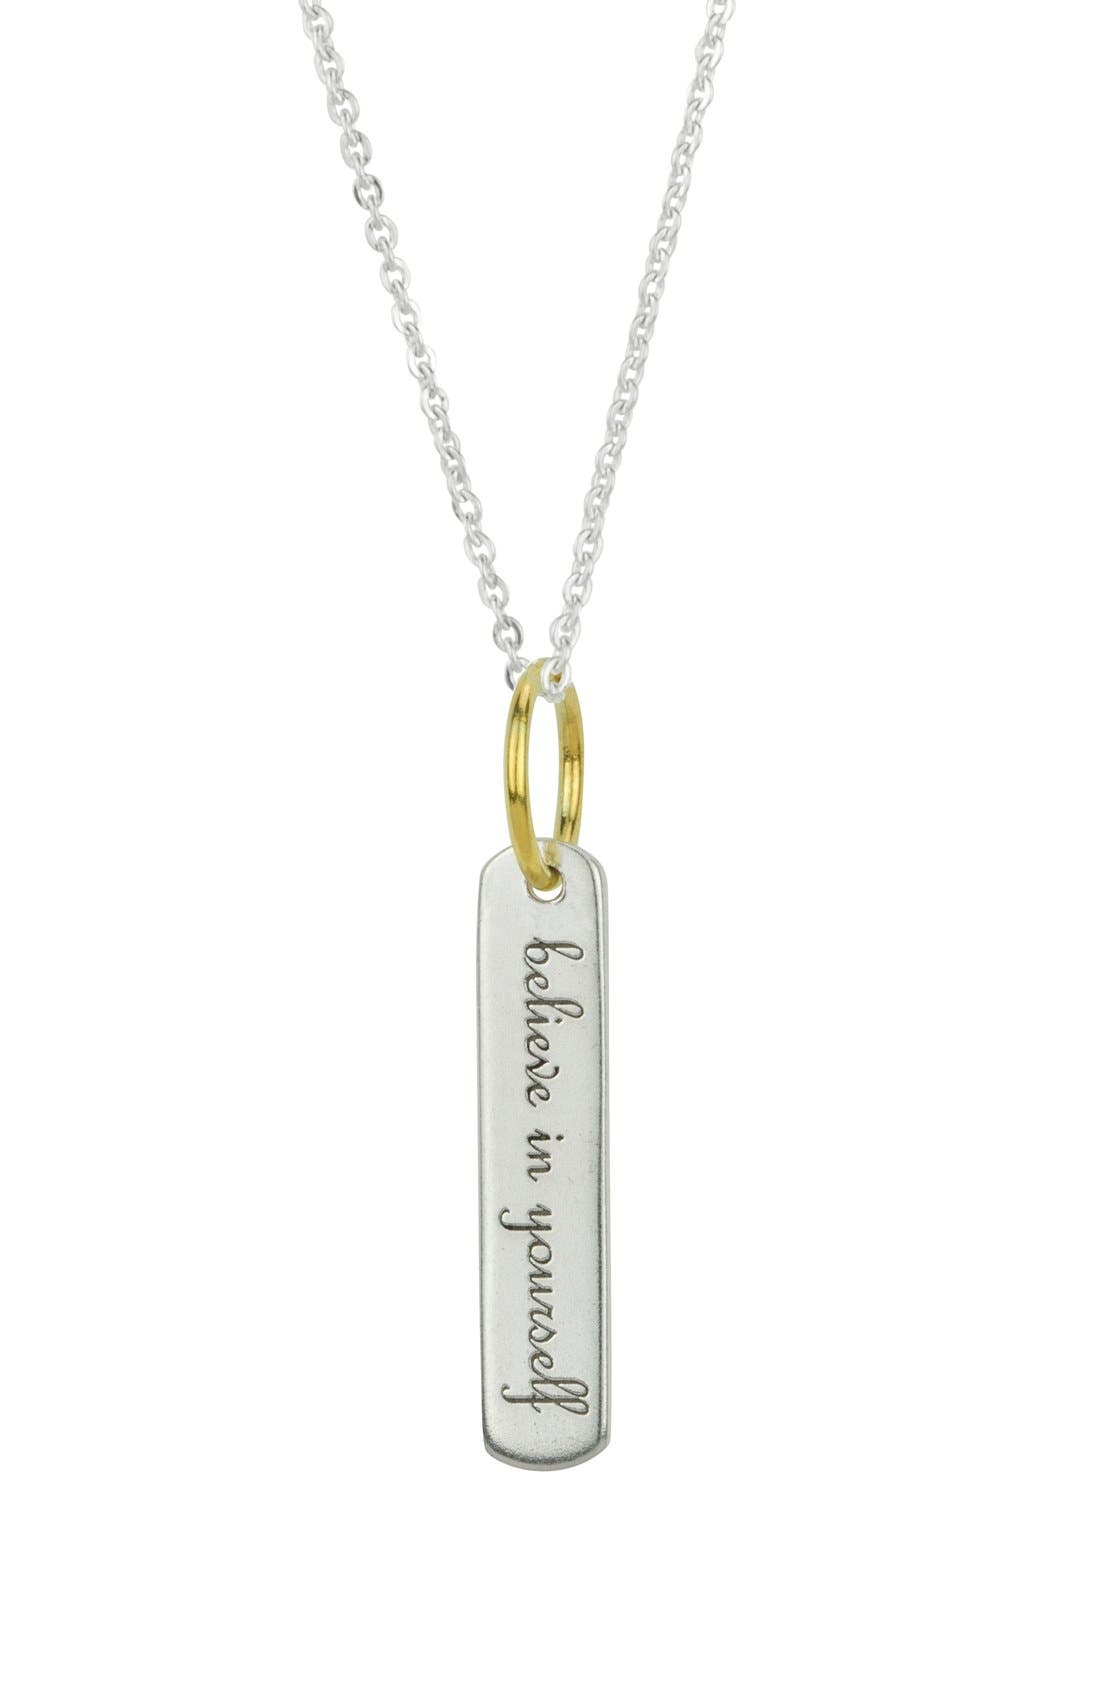 BARONI 'Believe' Engraved Pendant Necklace, Main, color, 040